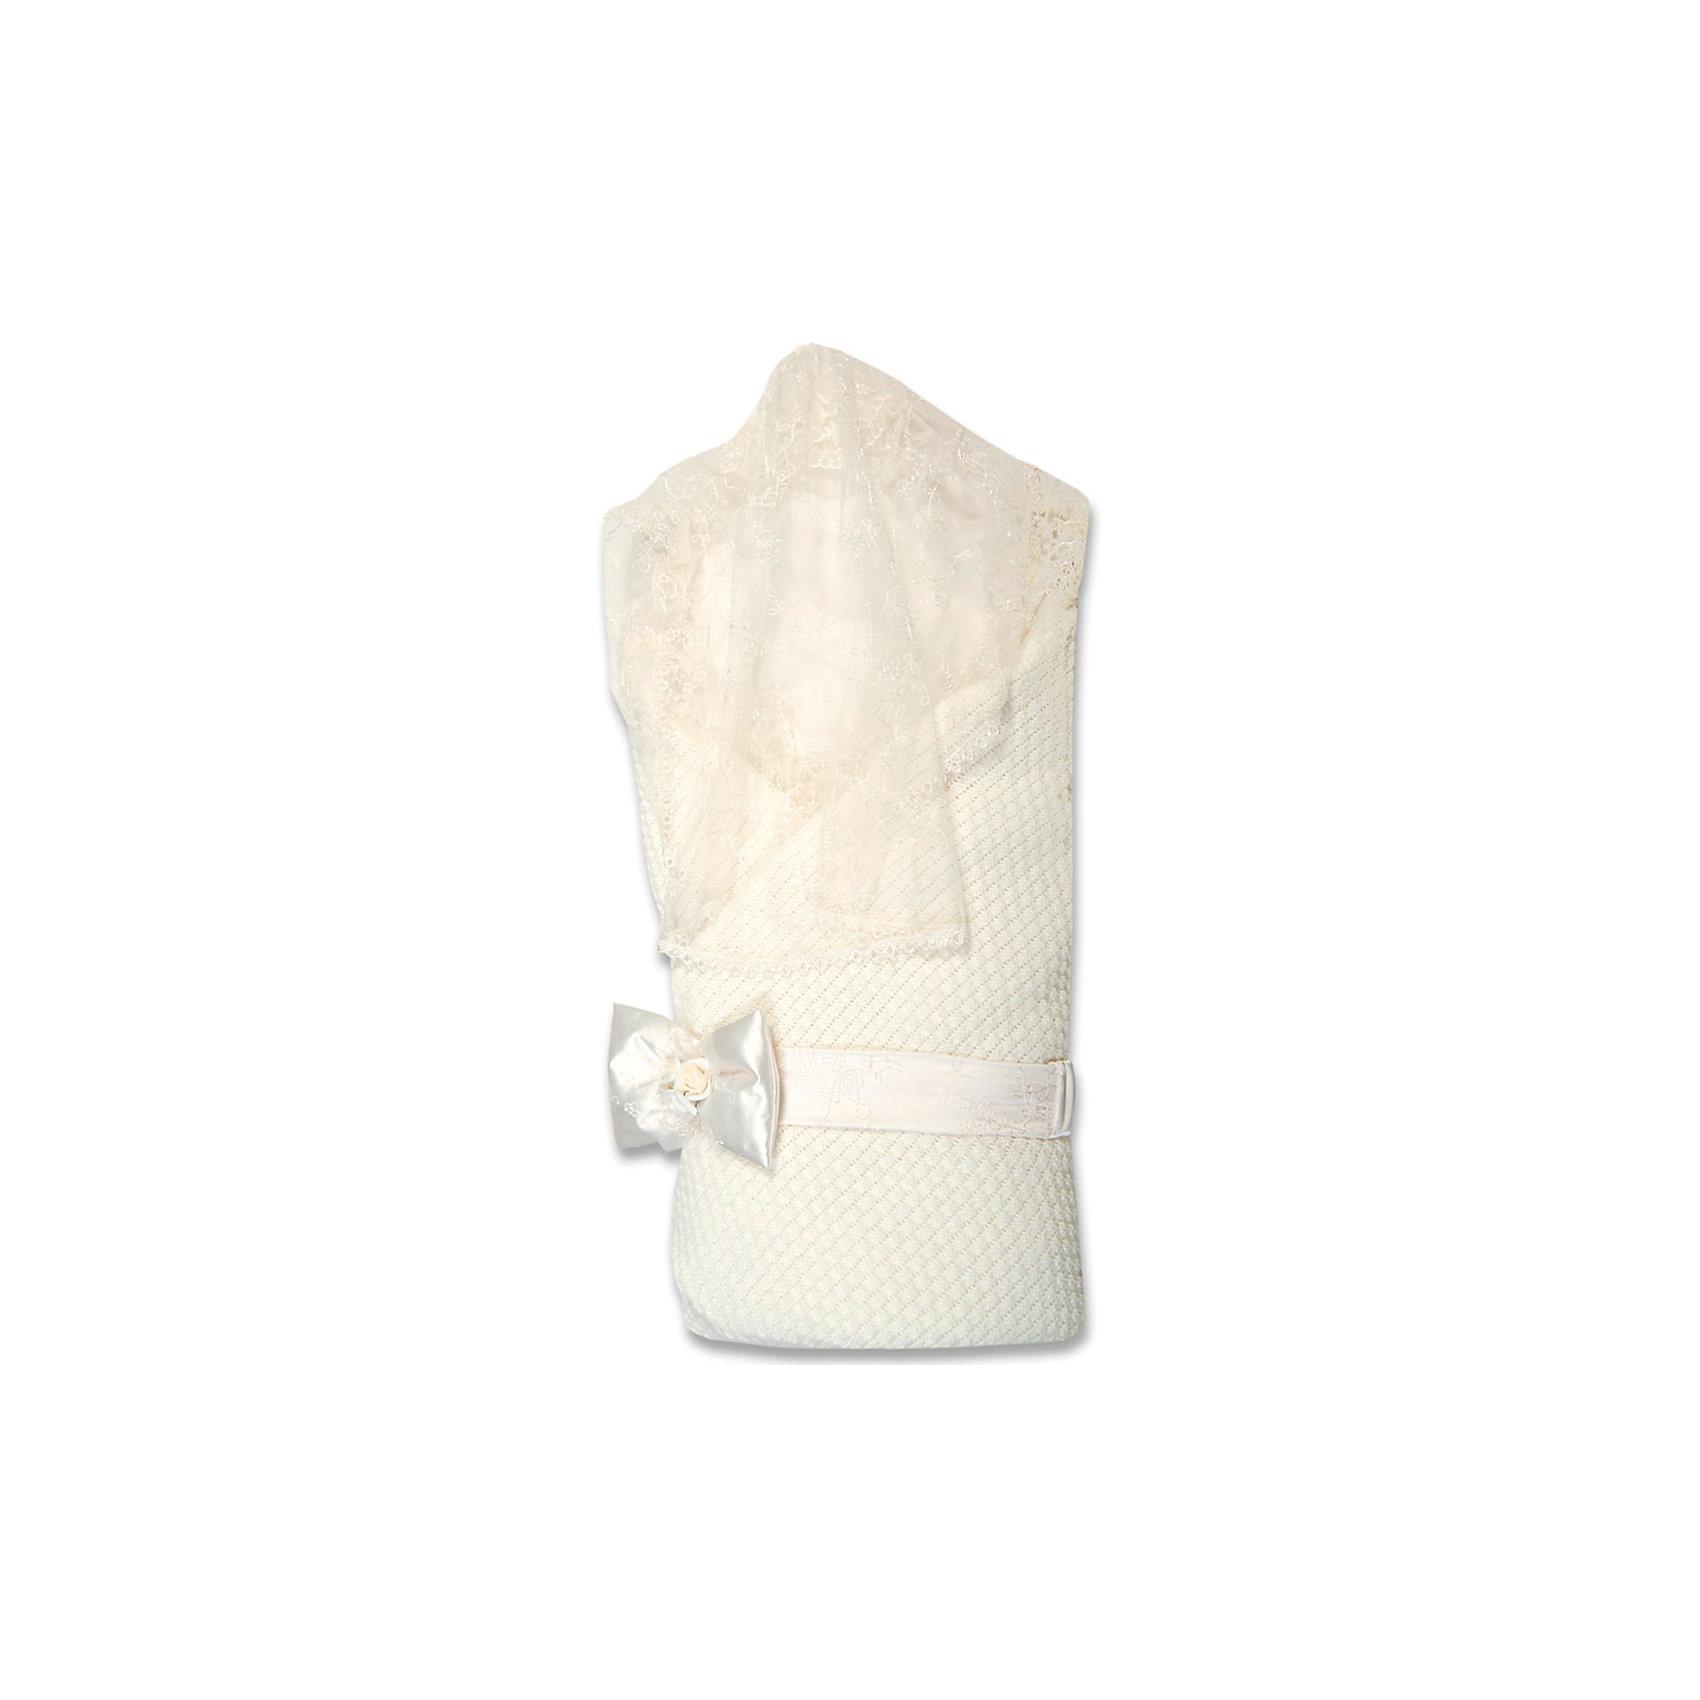 Сонный гномик Конверт-одеяло Жемчужинка, Сонный гномик, молочный